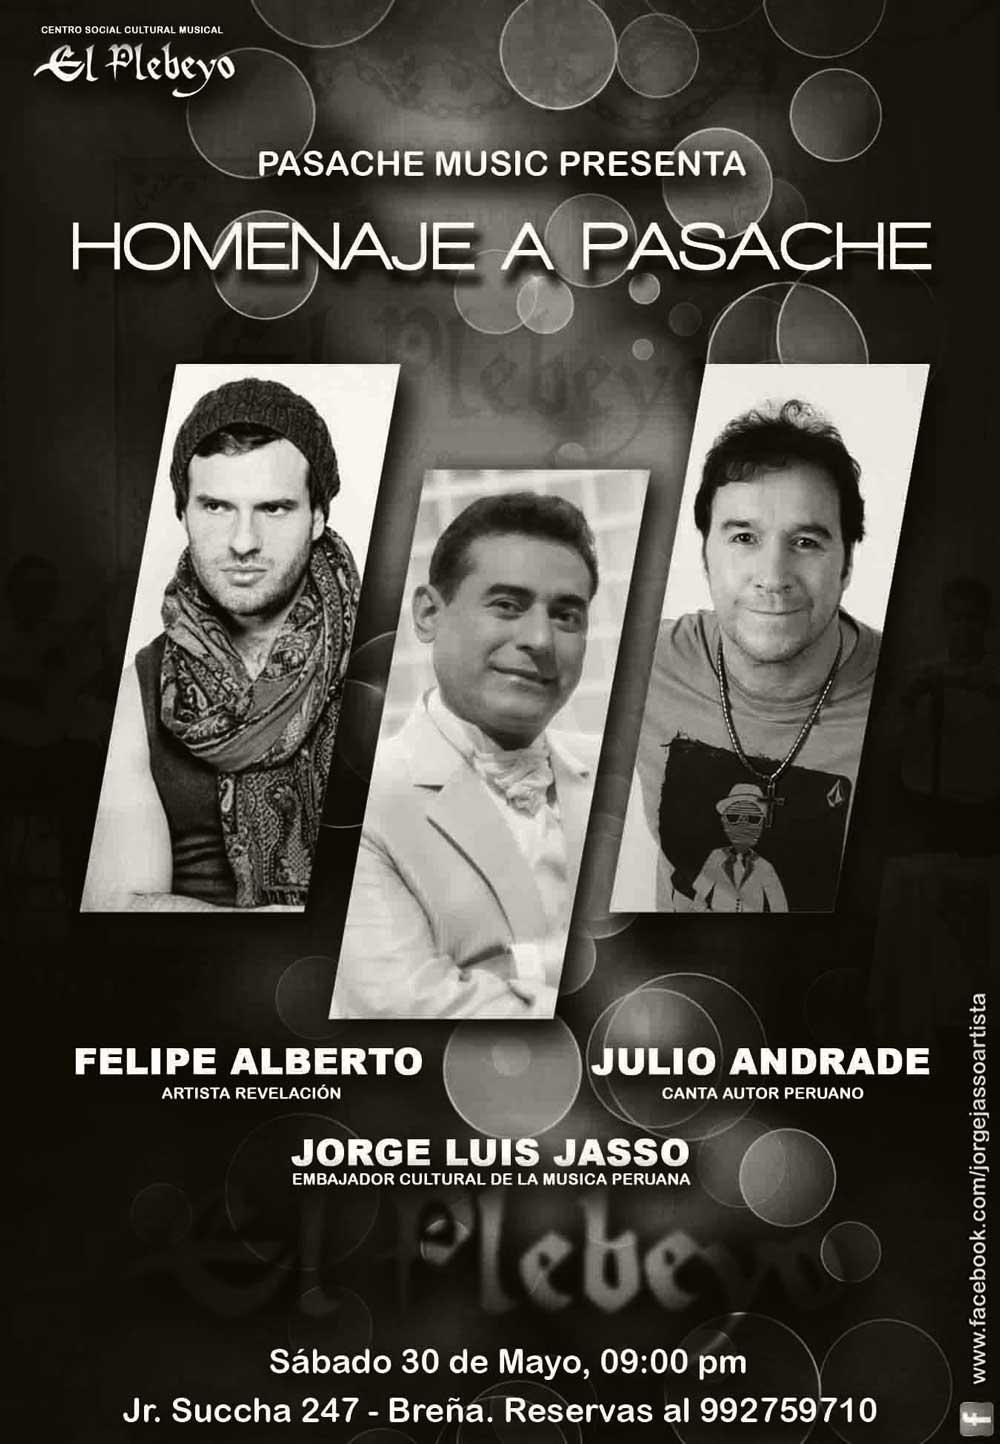 Felipe Alberto - Homejane a Pasache Concert 2015